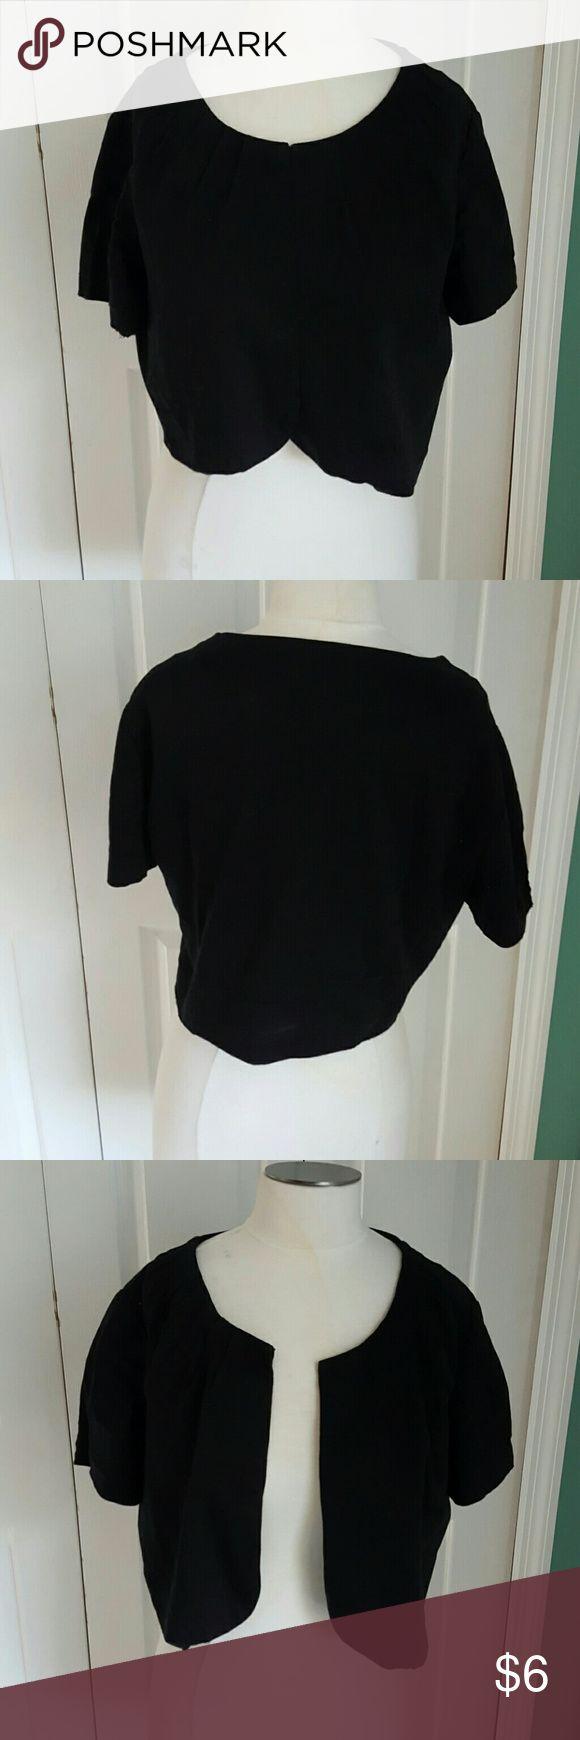 R&K Originals black Cropped jacket, size XL Black crop jacket by R&K Originals, size XL R&K Originals  Jackets & Coats